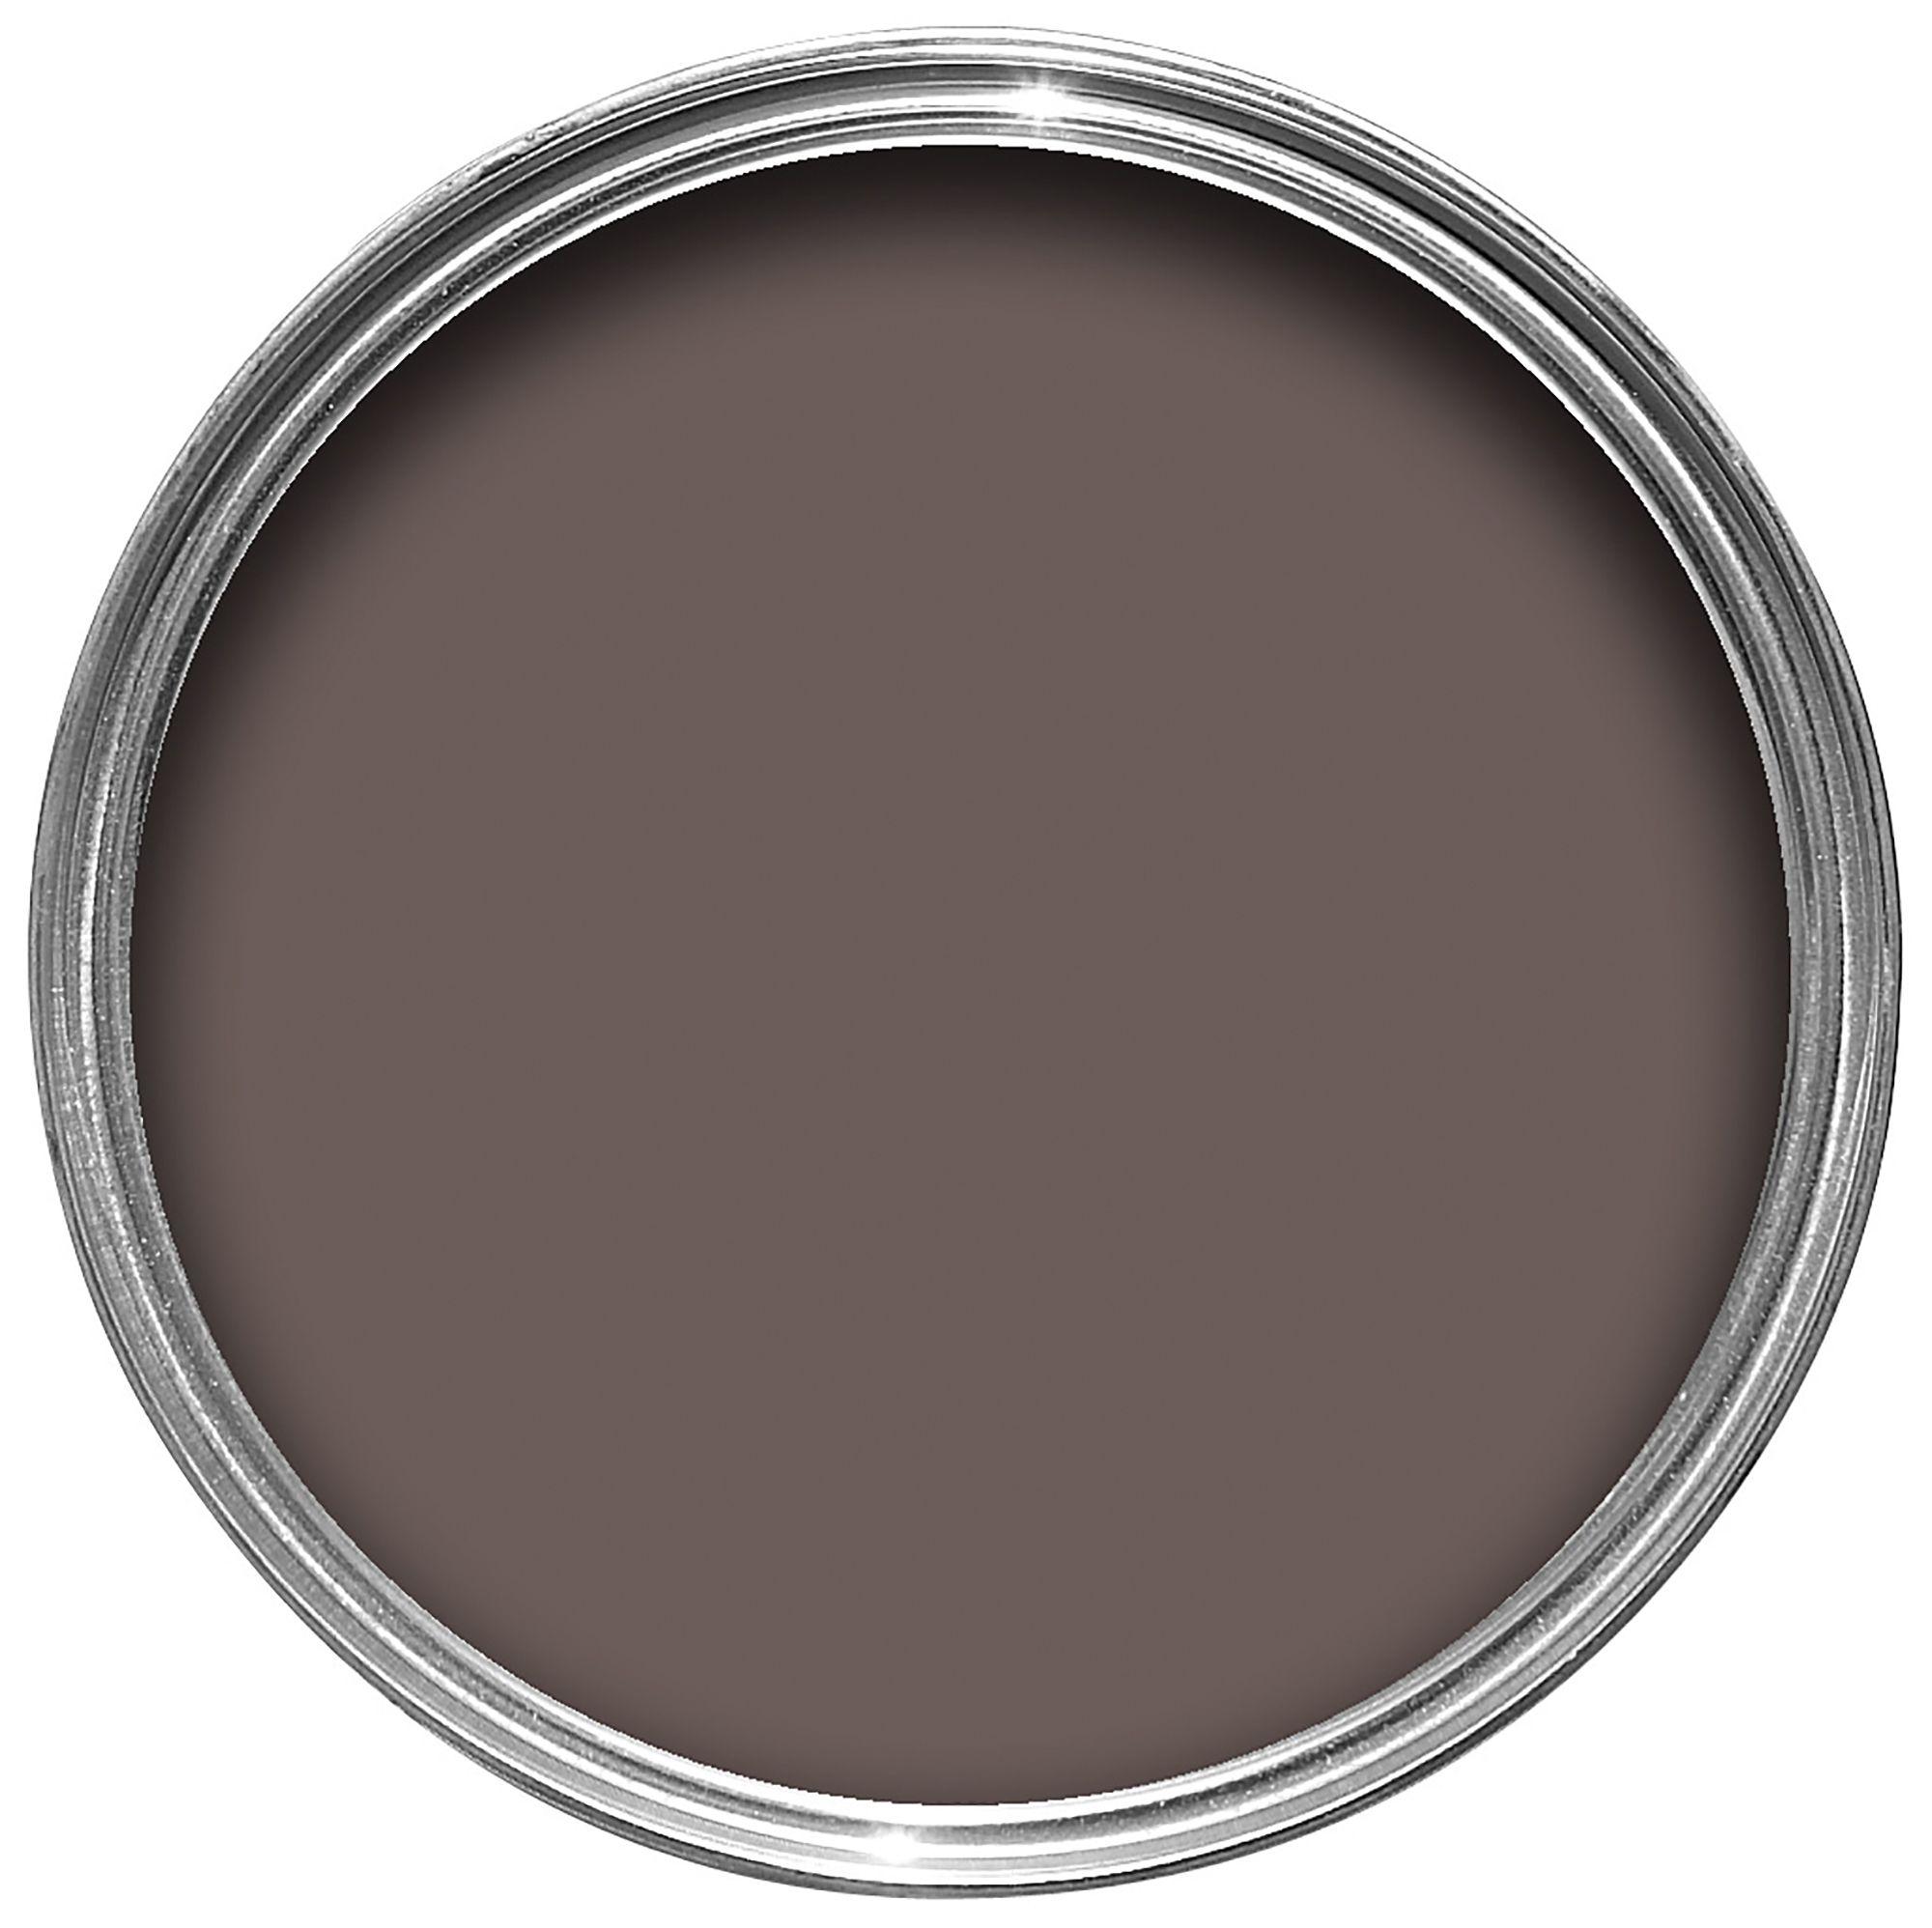 colours cocoa bean silk emulsion paint 2 5l departments. Black Bedroom Furniture Sets. Home Design Ideas